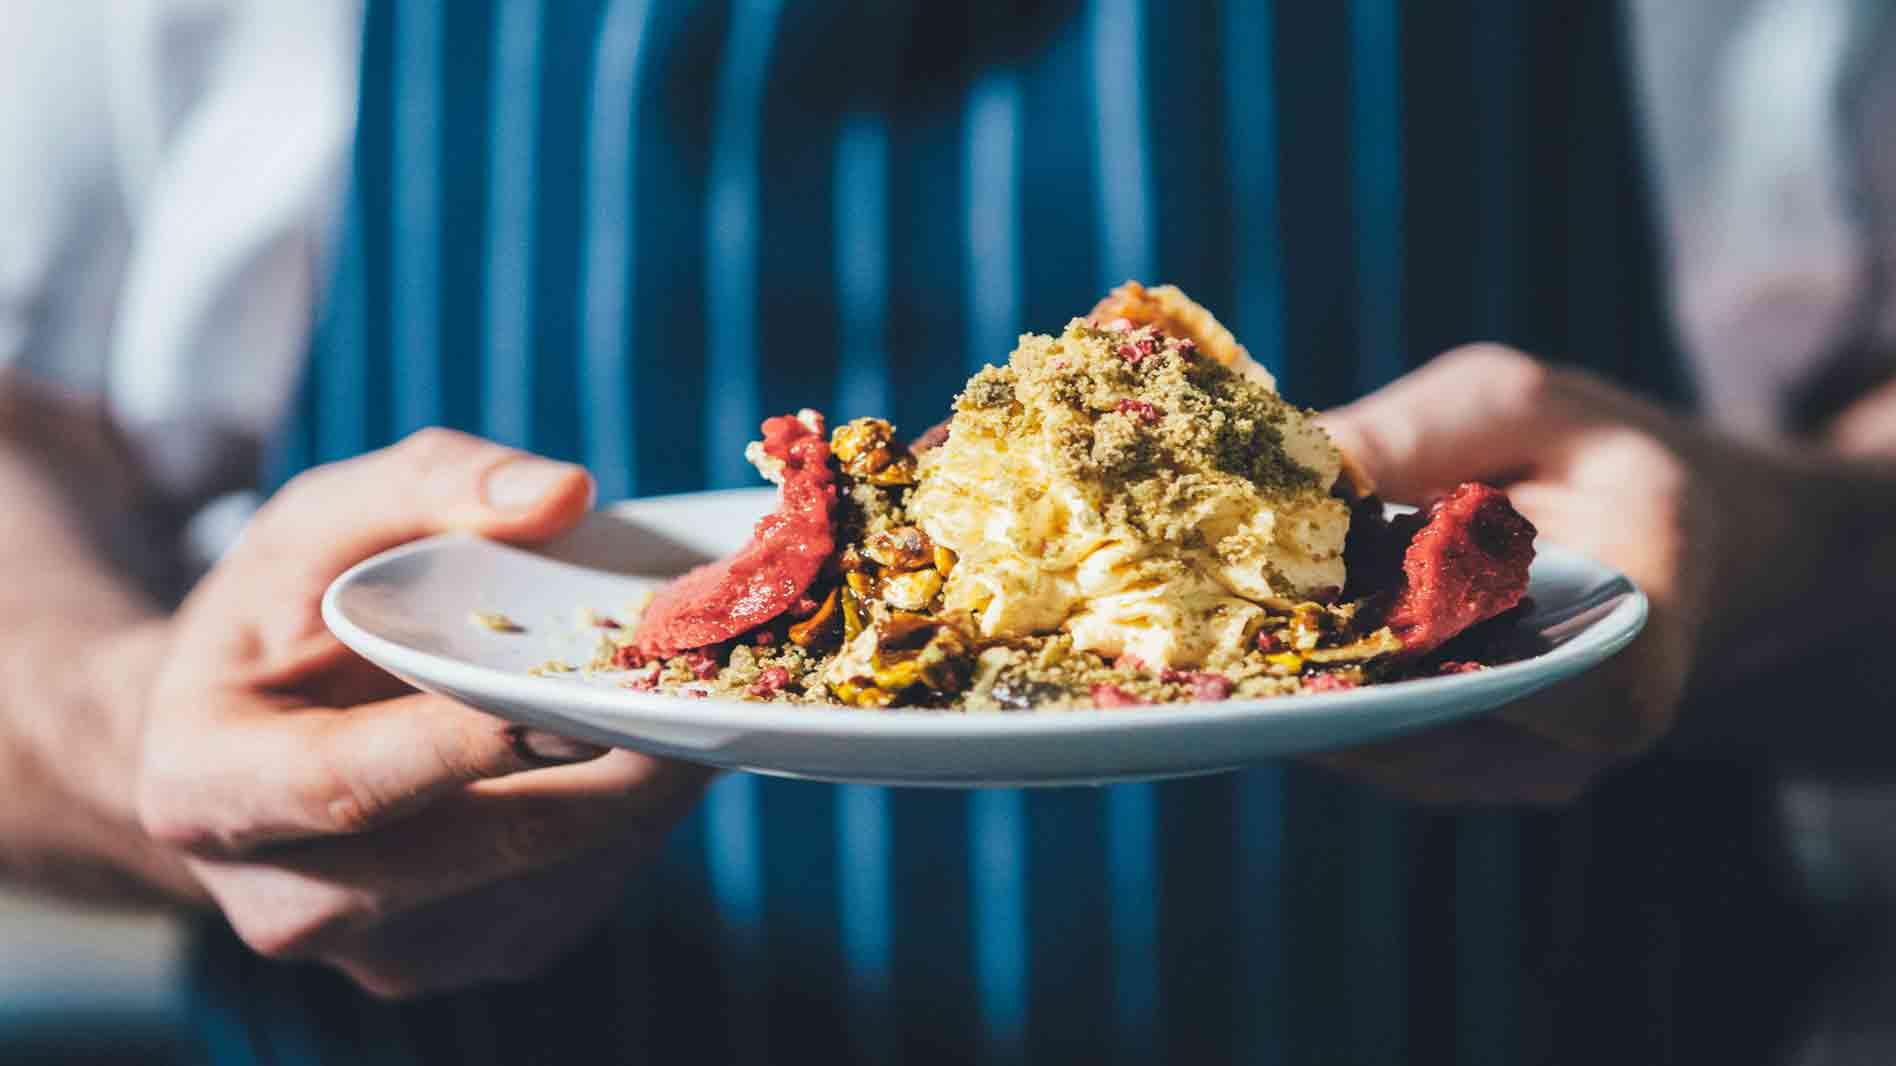 Raspberry and Pistachio Cheesecake